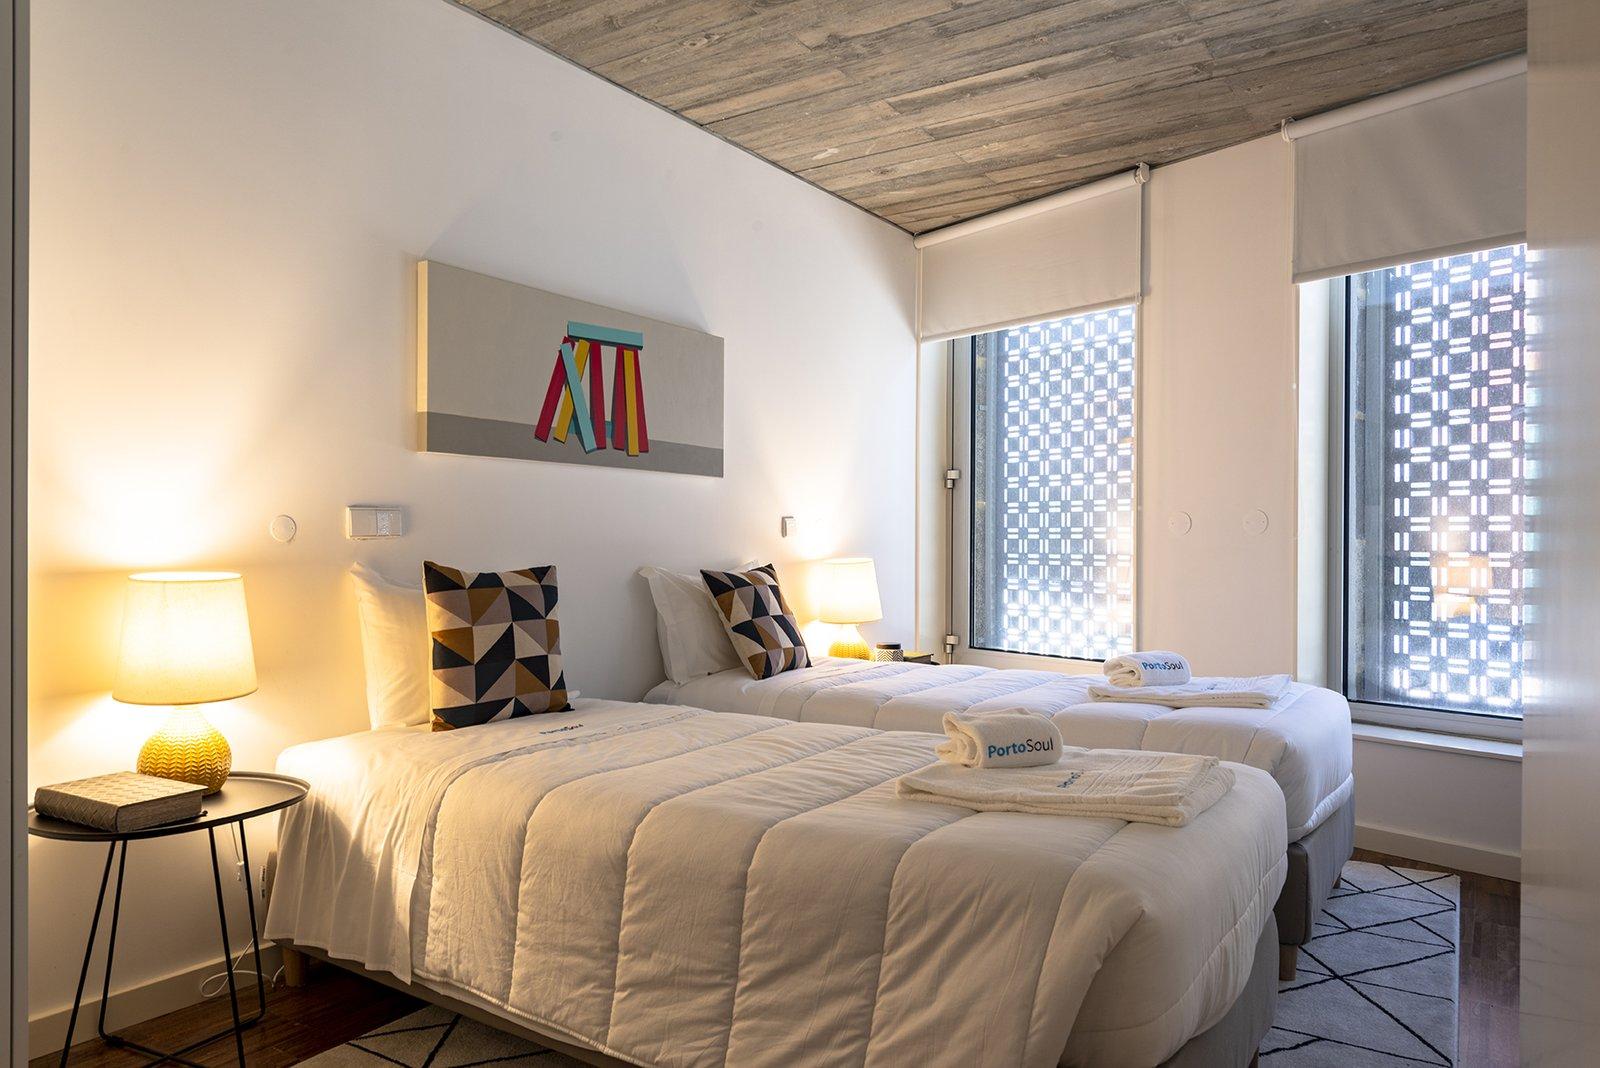 Bedroom  Alferes Malheiro Building